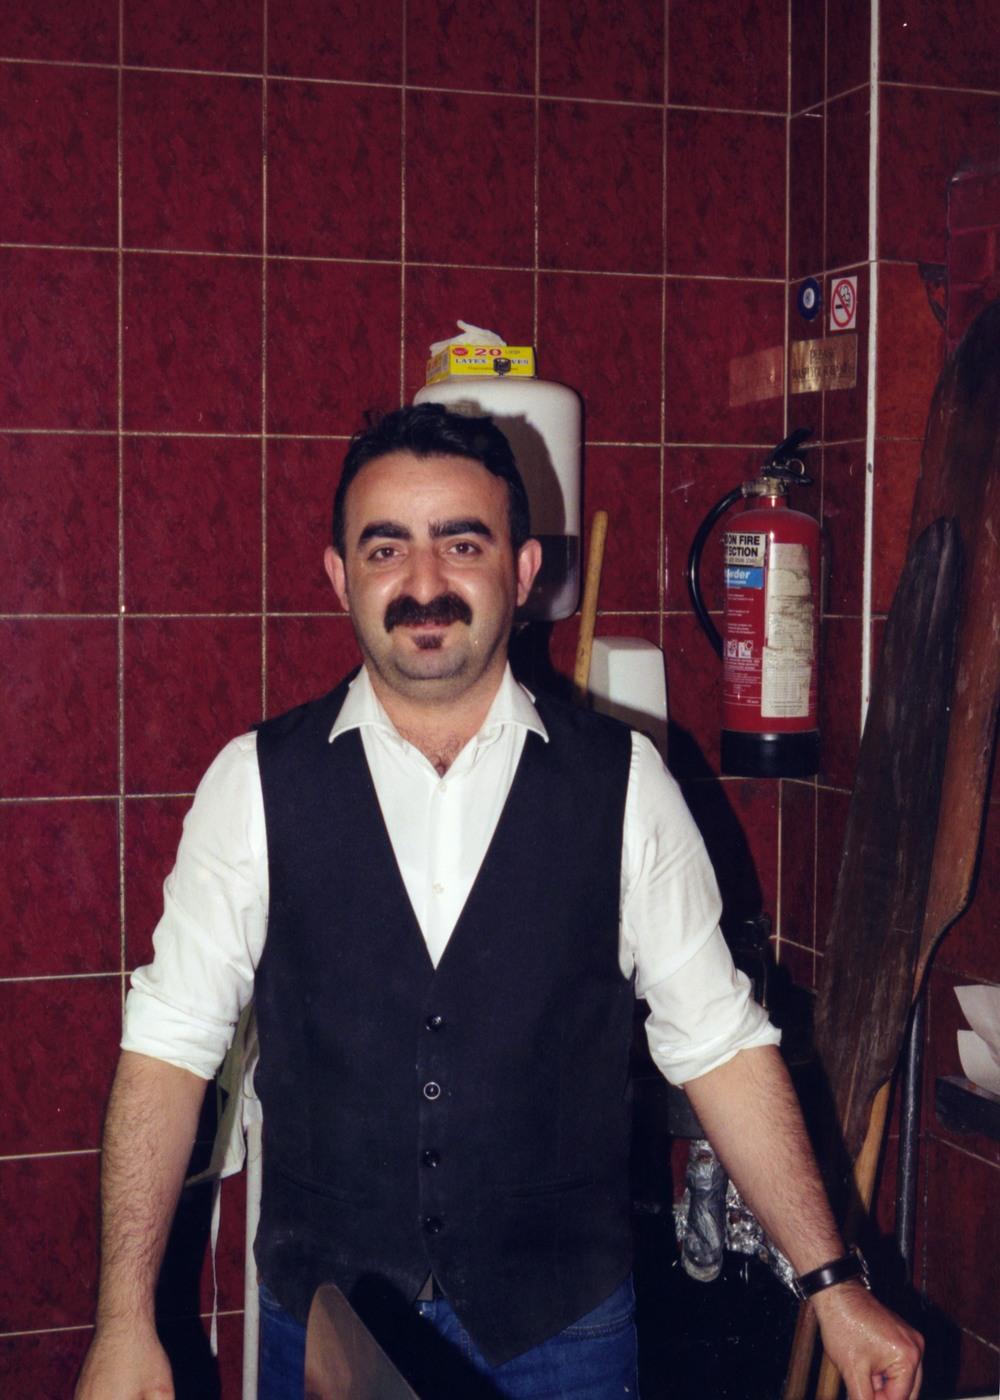 chef_1 5.jpg